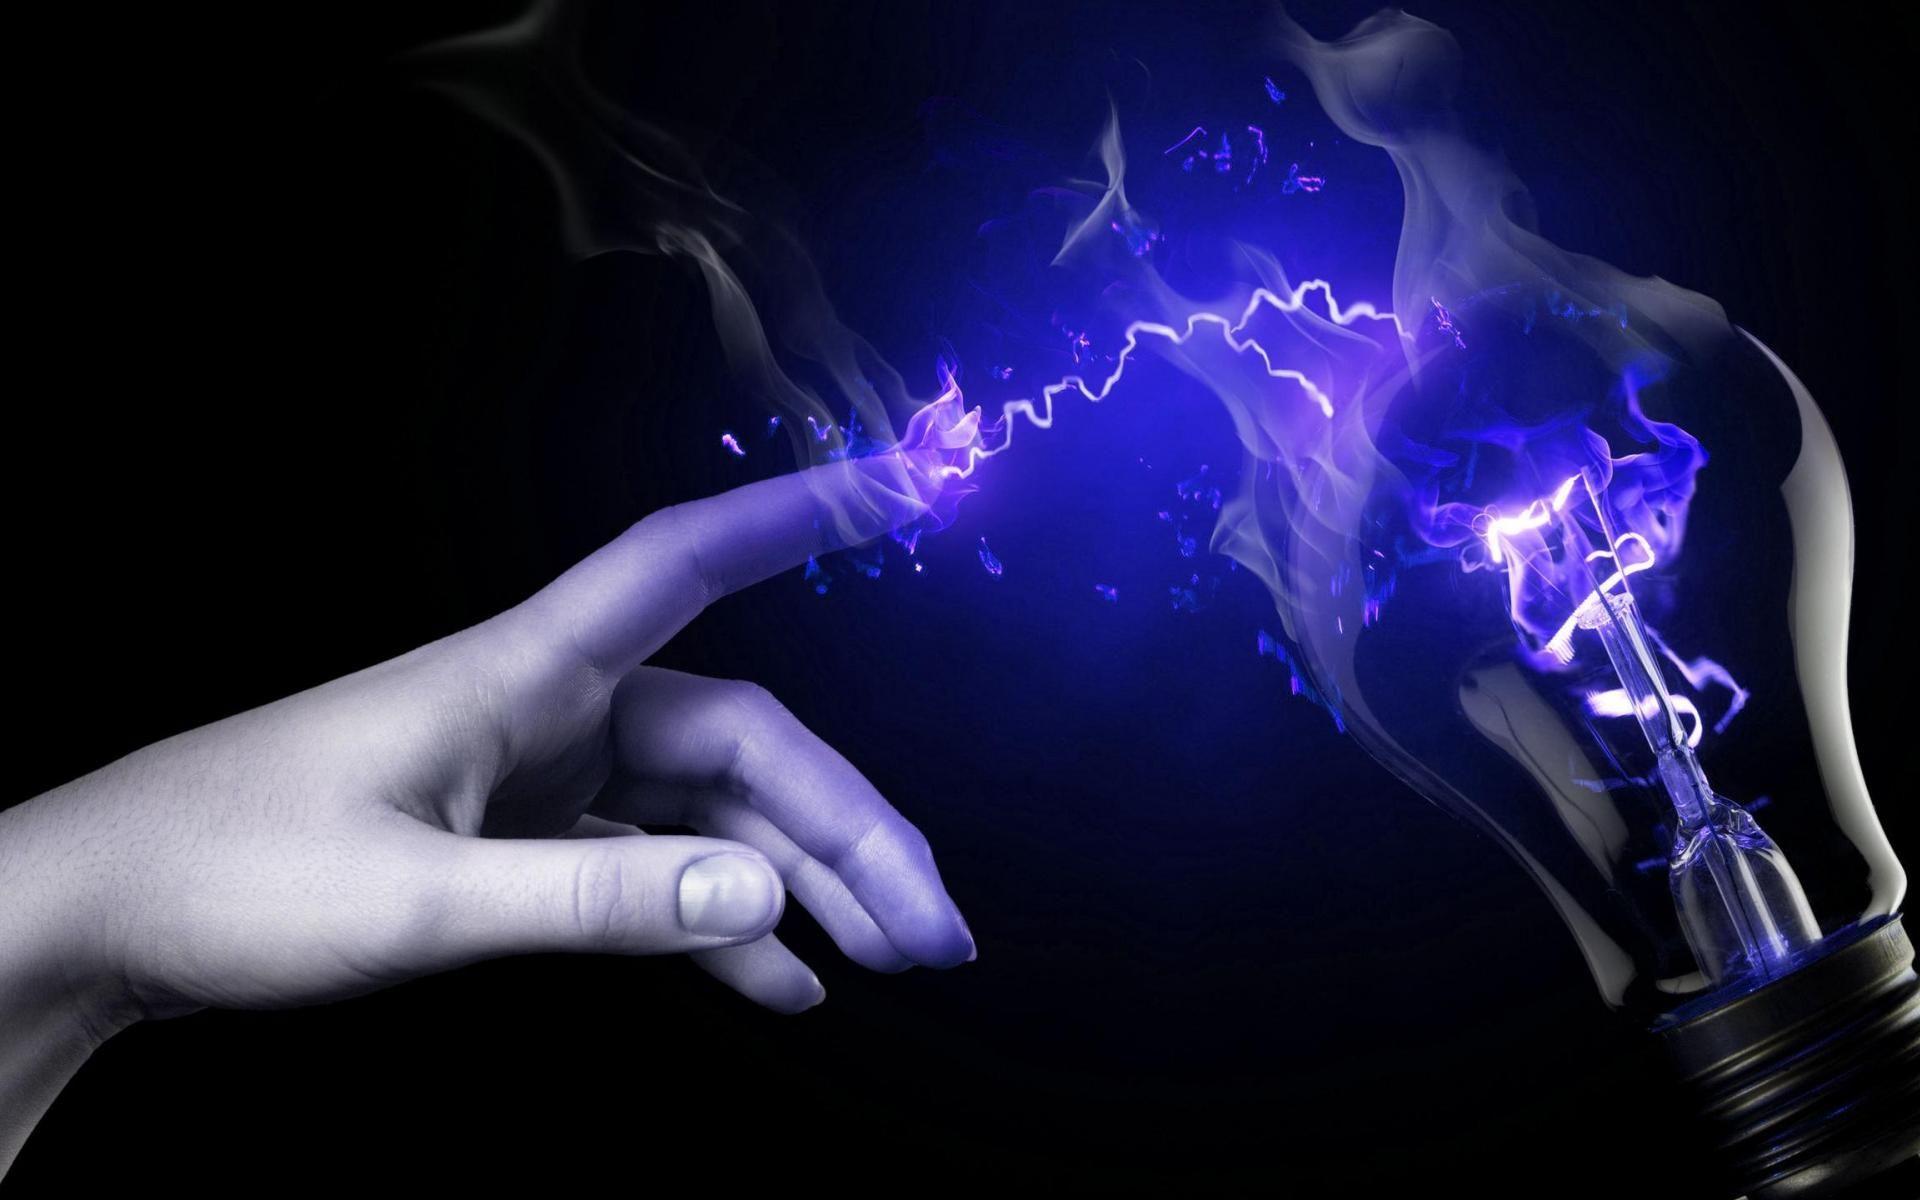 Electricity Desktop Wallpaper Electricity Backgrounds Cool Kodi Power Wallpaper Smoke Art